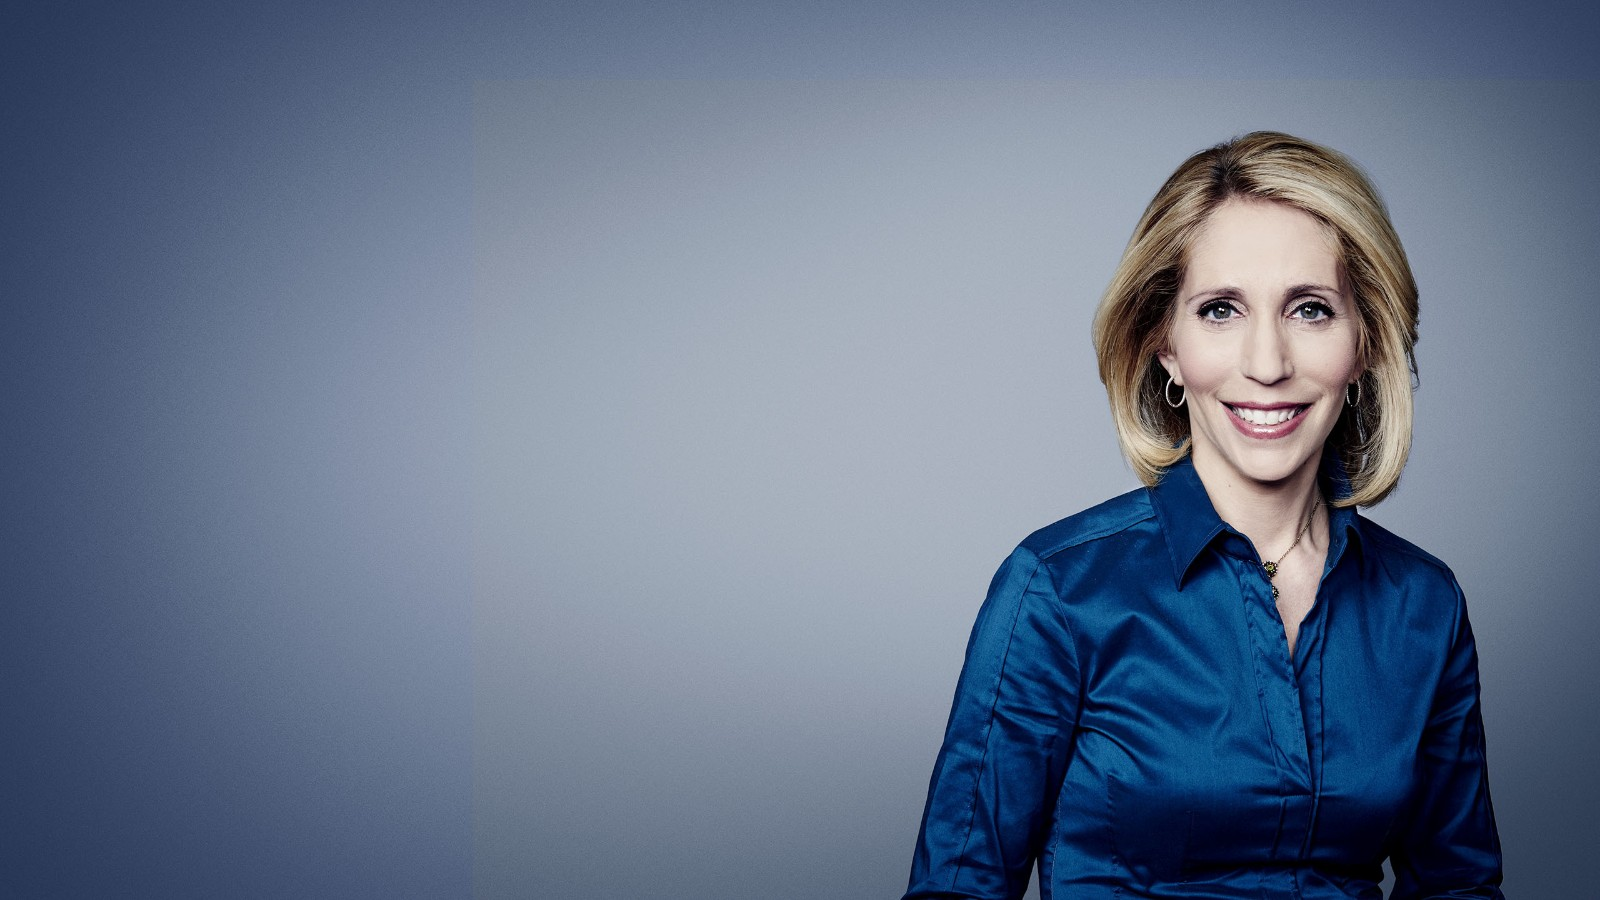 CNN Profiles - Dana Bash - Chief Political Correspondent ...